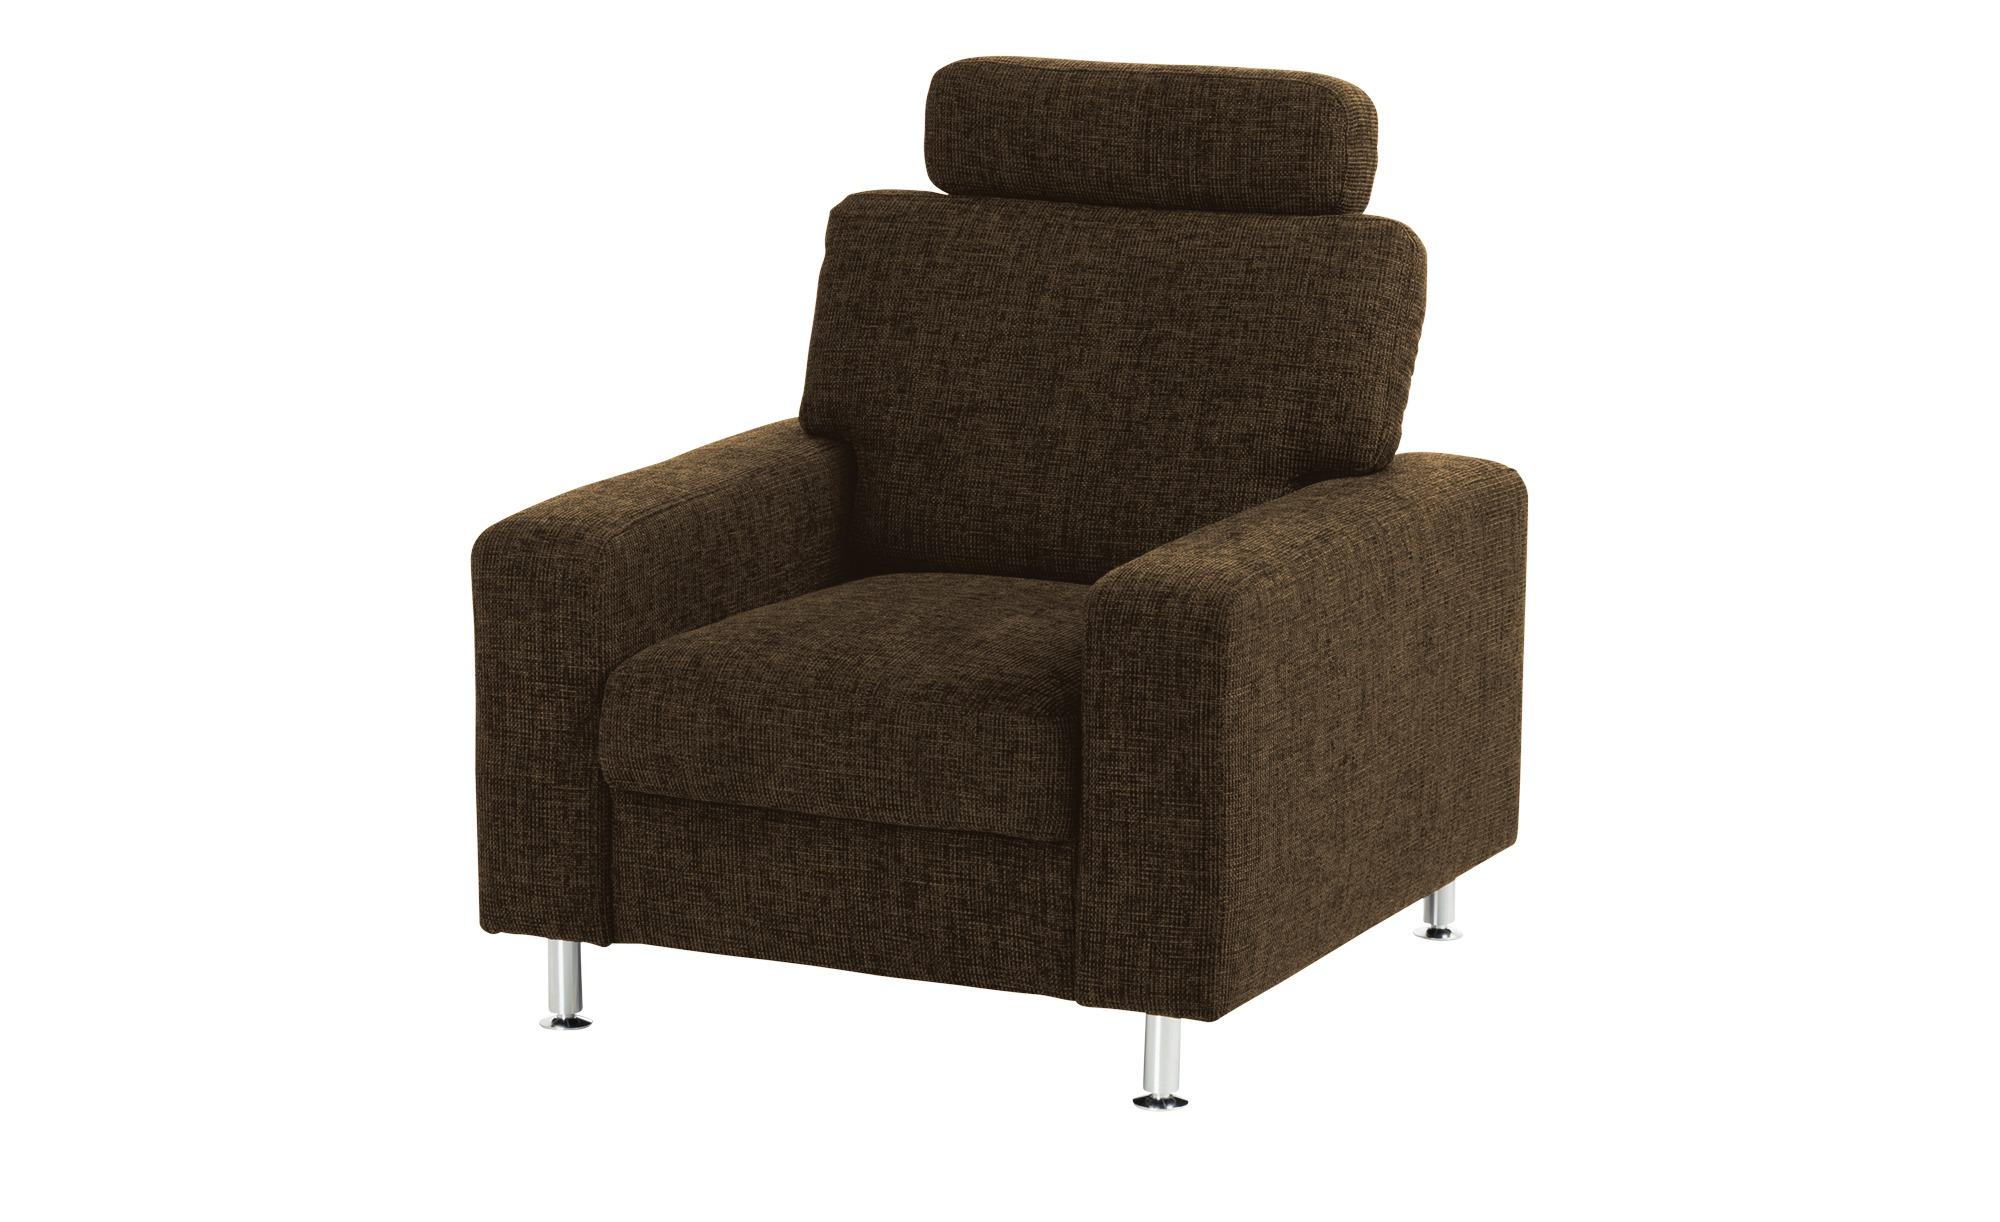 meinSofa Polstersessel   Jana ¦ braun ¦ Maße (cm): B: 88 H: 85 T: 95 Polstermöbel > Sessel > Polstersessel - Höffner